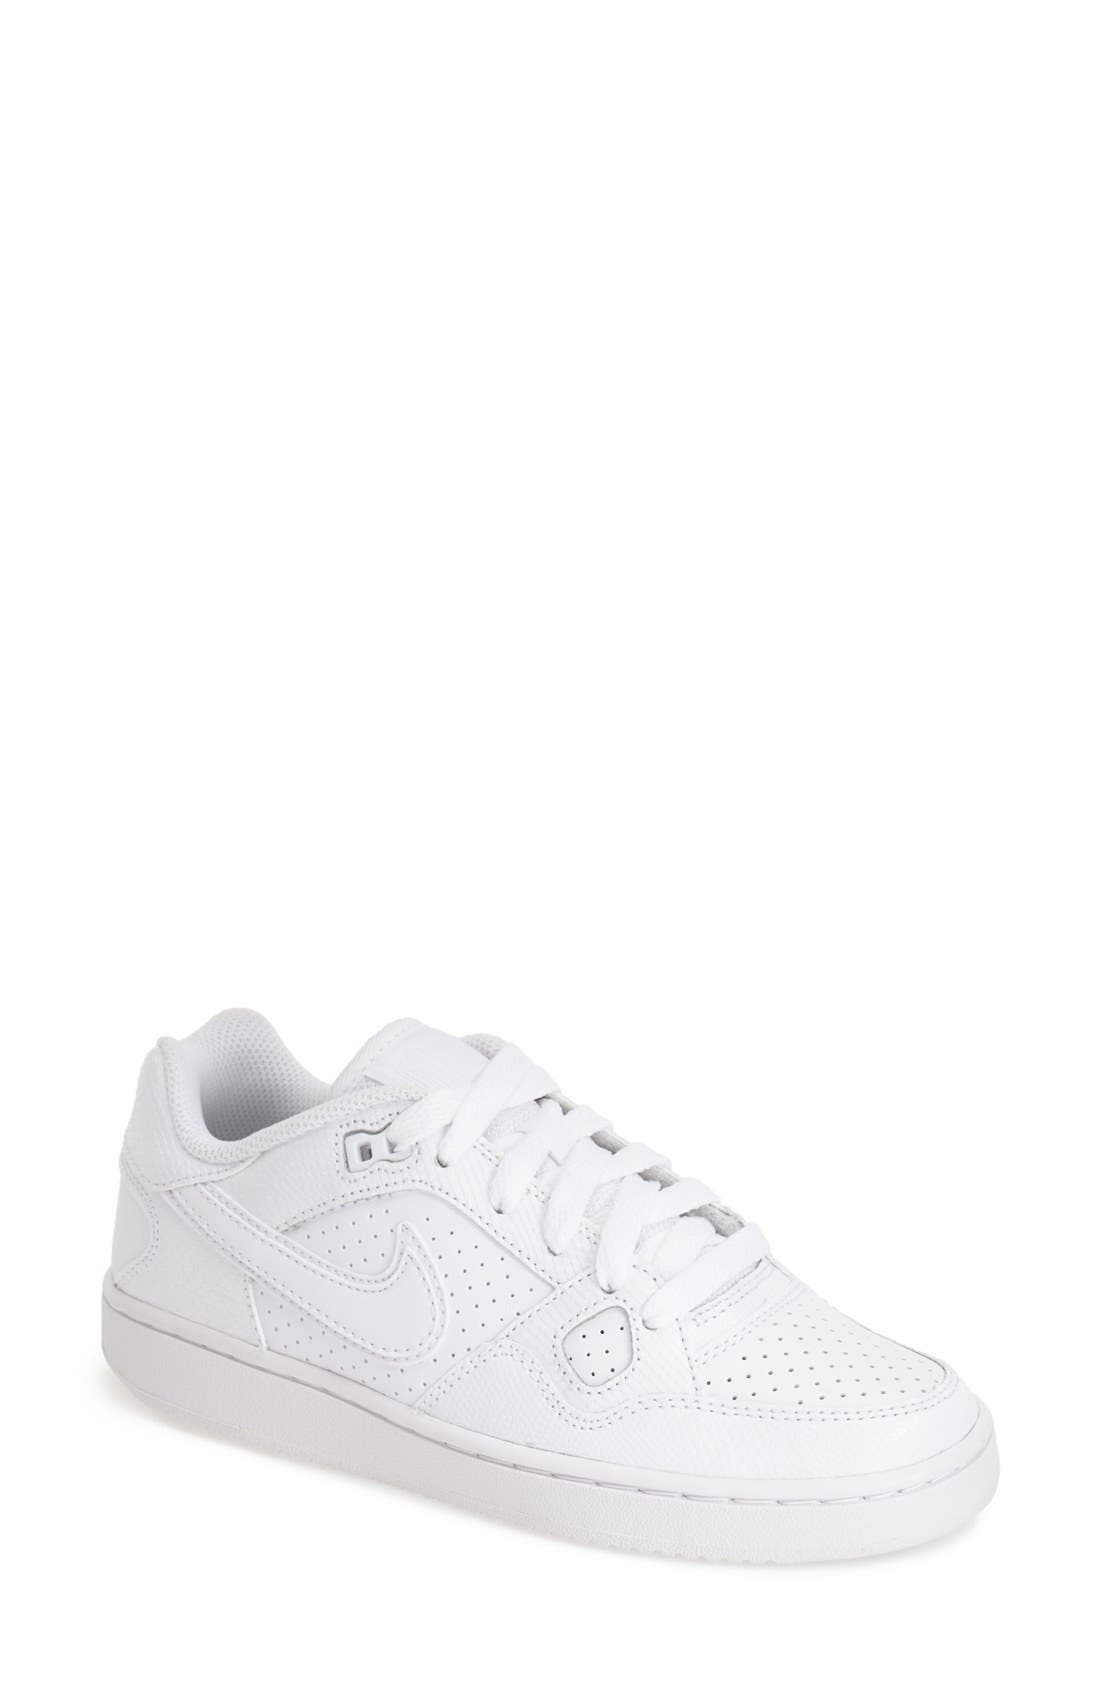 Alternate Image 1 Selected - Nike 'Son of Force' Sneaker (Women)